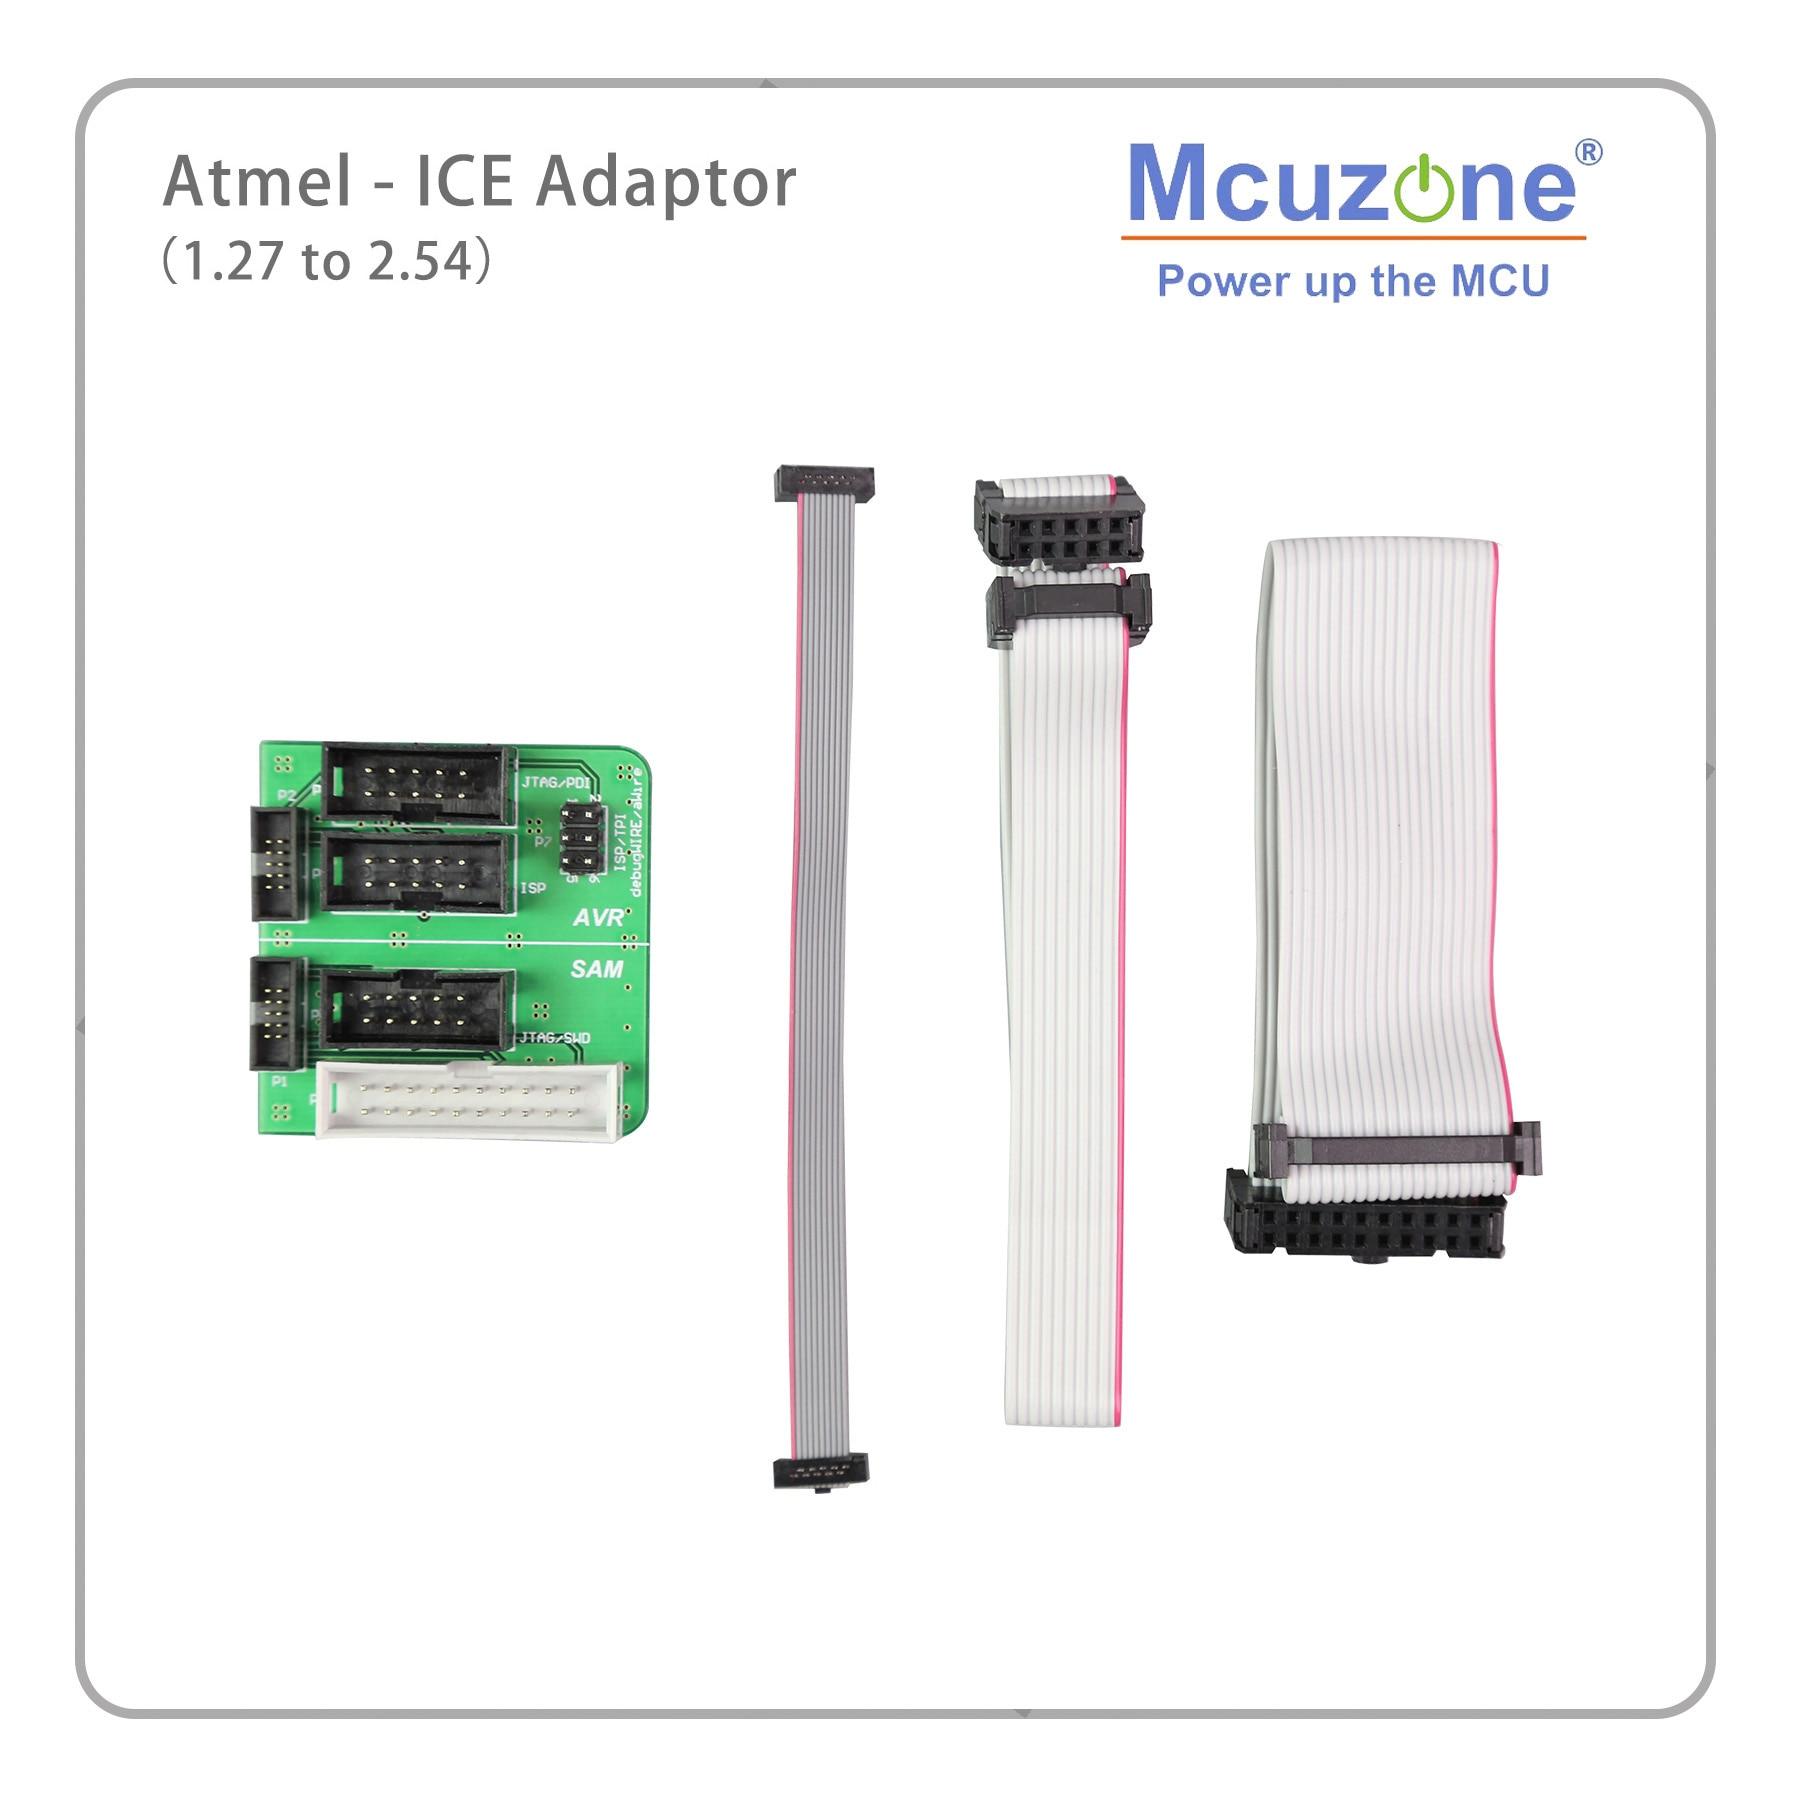 Mcuzone Atmel-ICE  Adapter Board   1.27 TO 2.54  AVR(ISP JTAG PDI TPI) SAM(JTAG SWD) ATATMEL-ICE-ADPT Atmel-ICE Adapter Kit